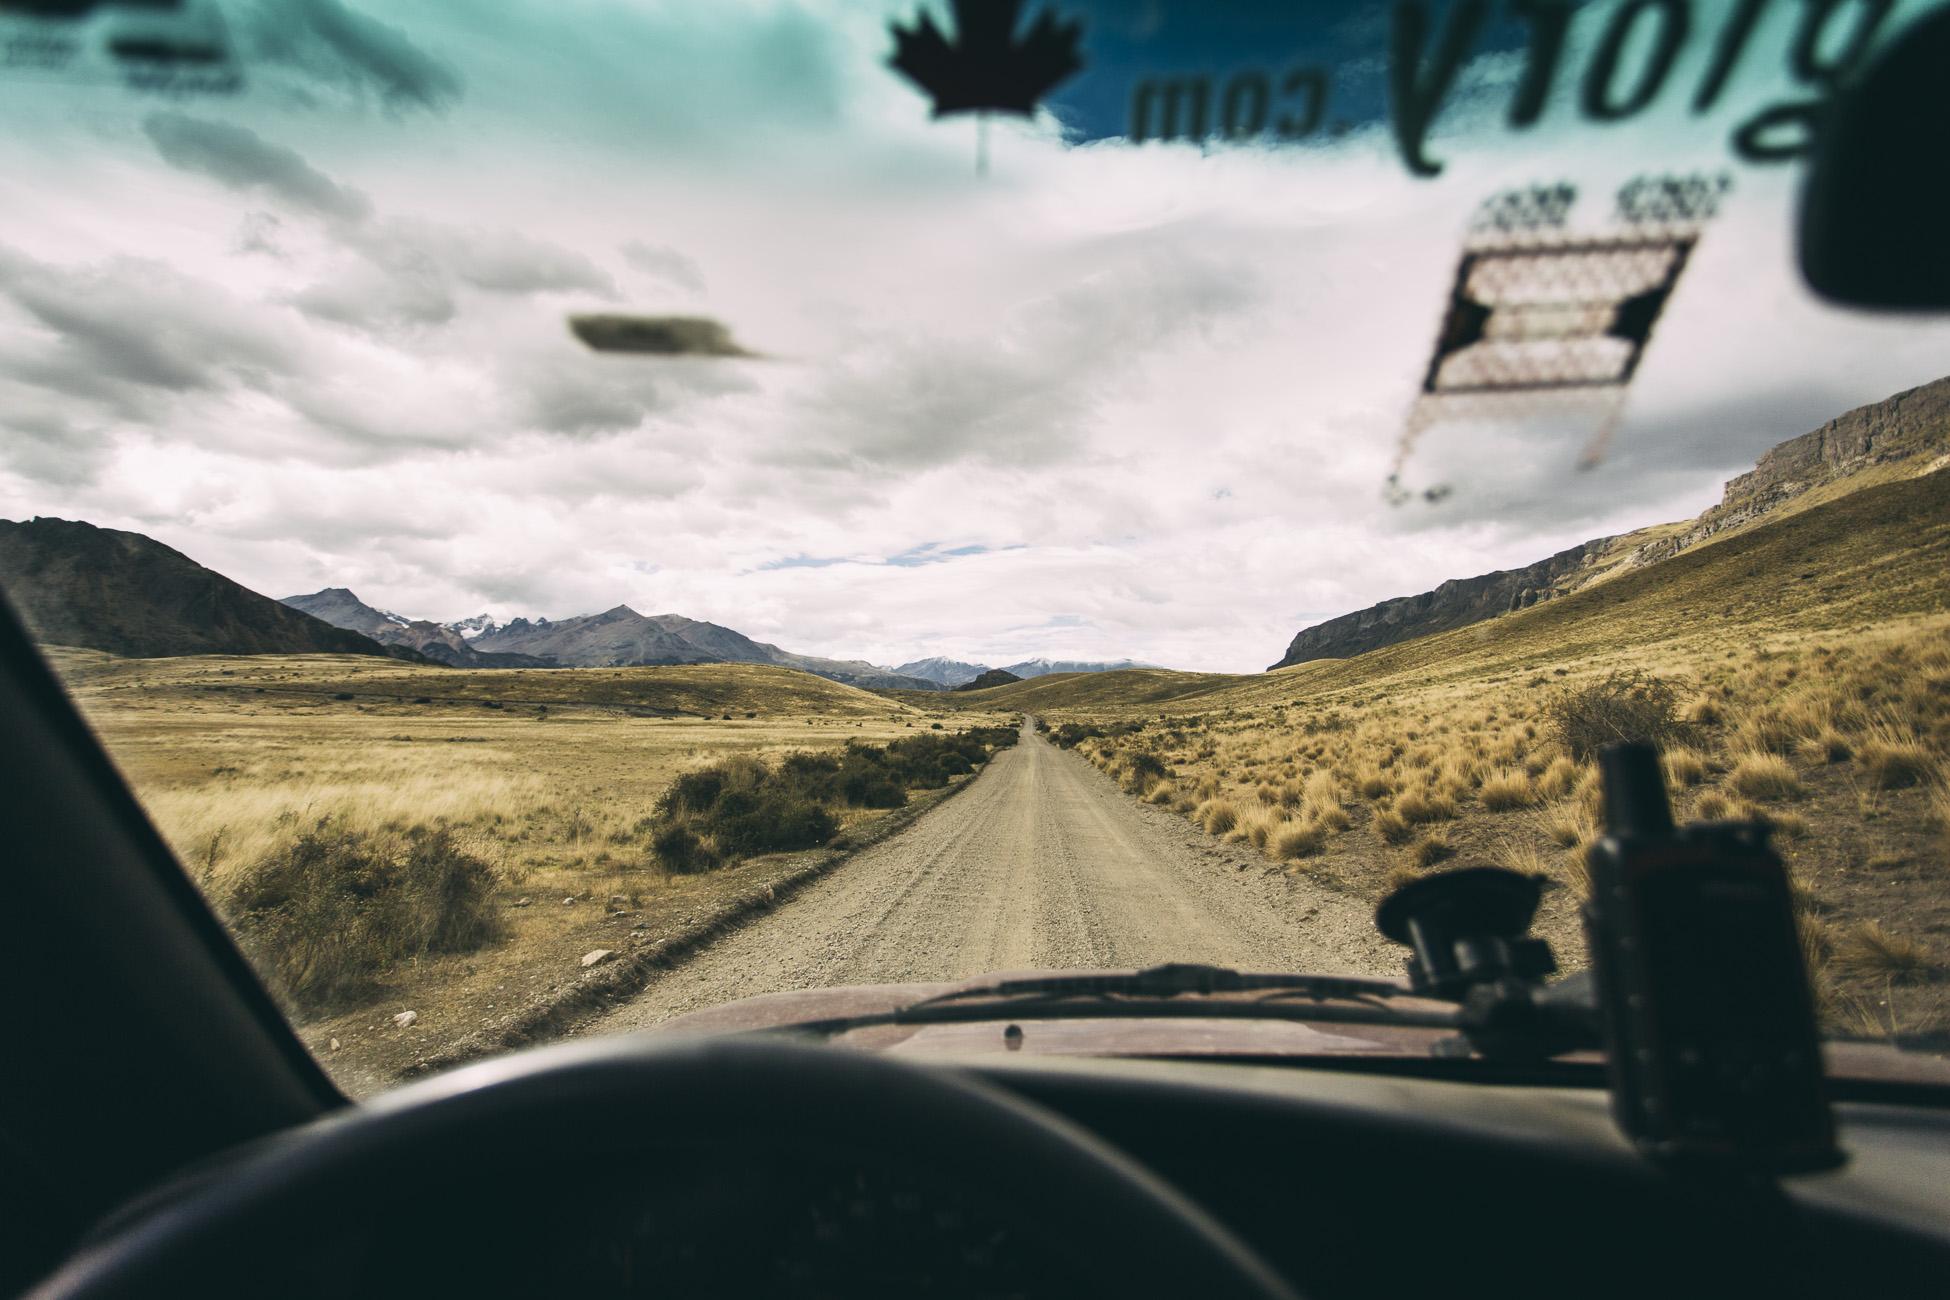 desktoglory_carretera_austral-96